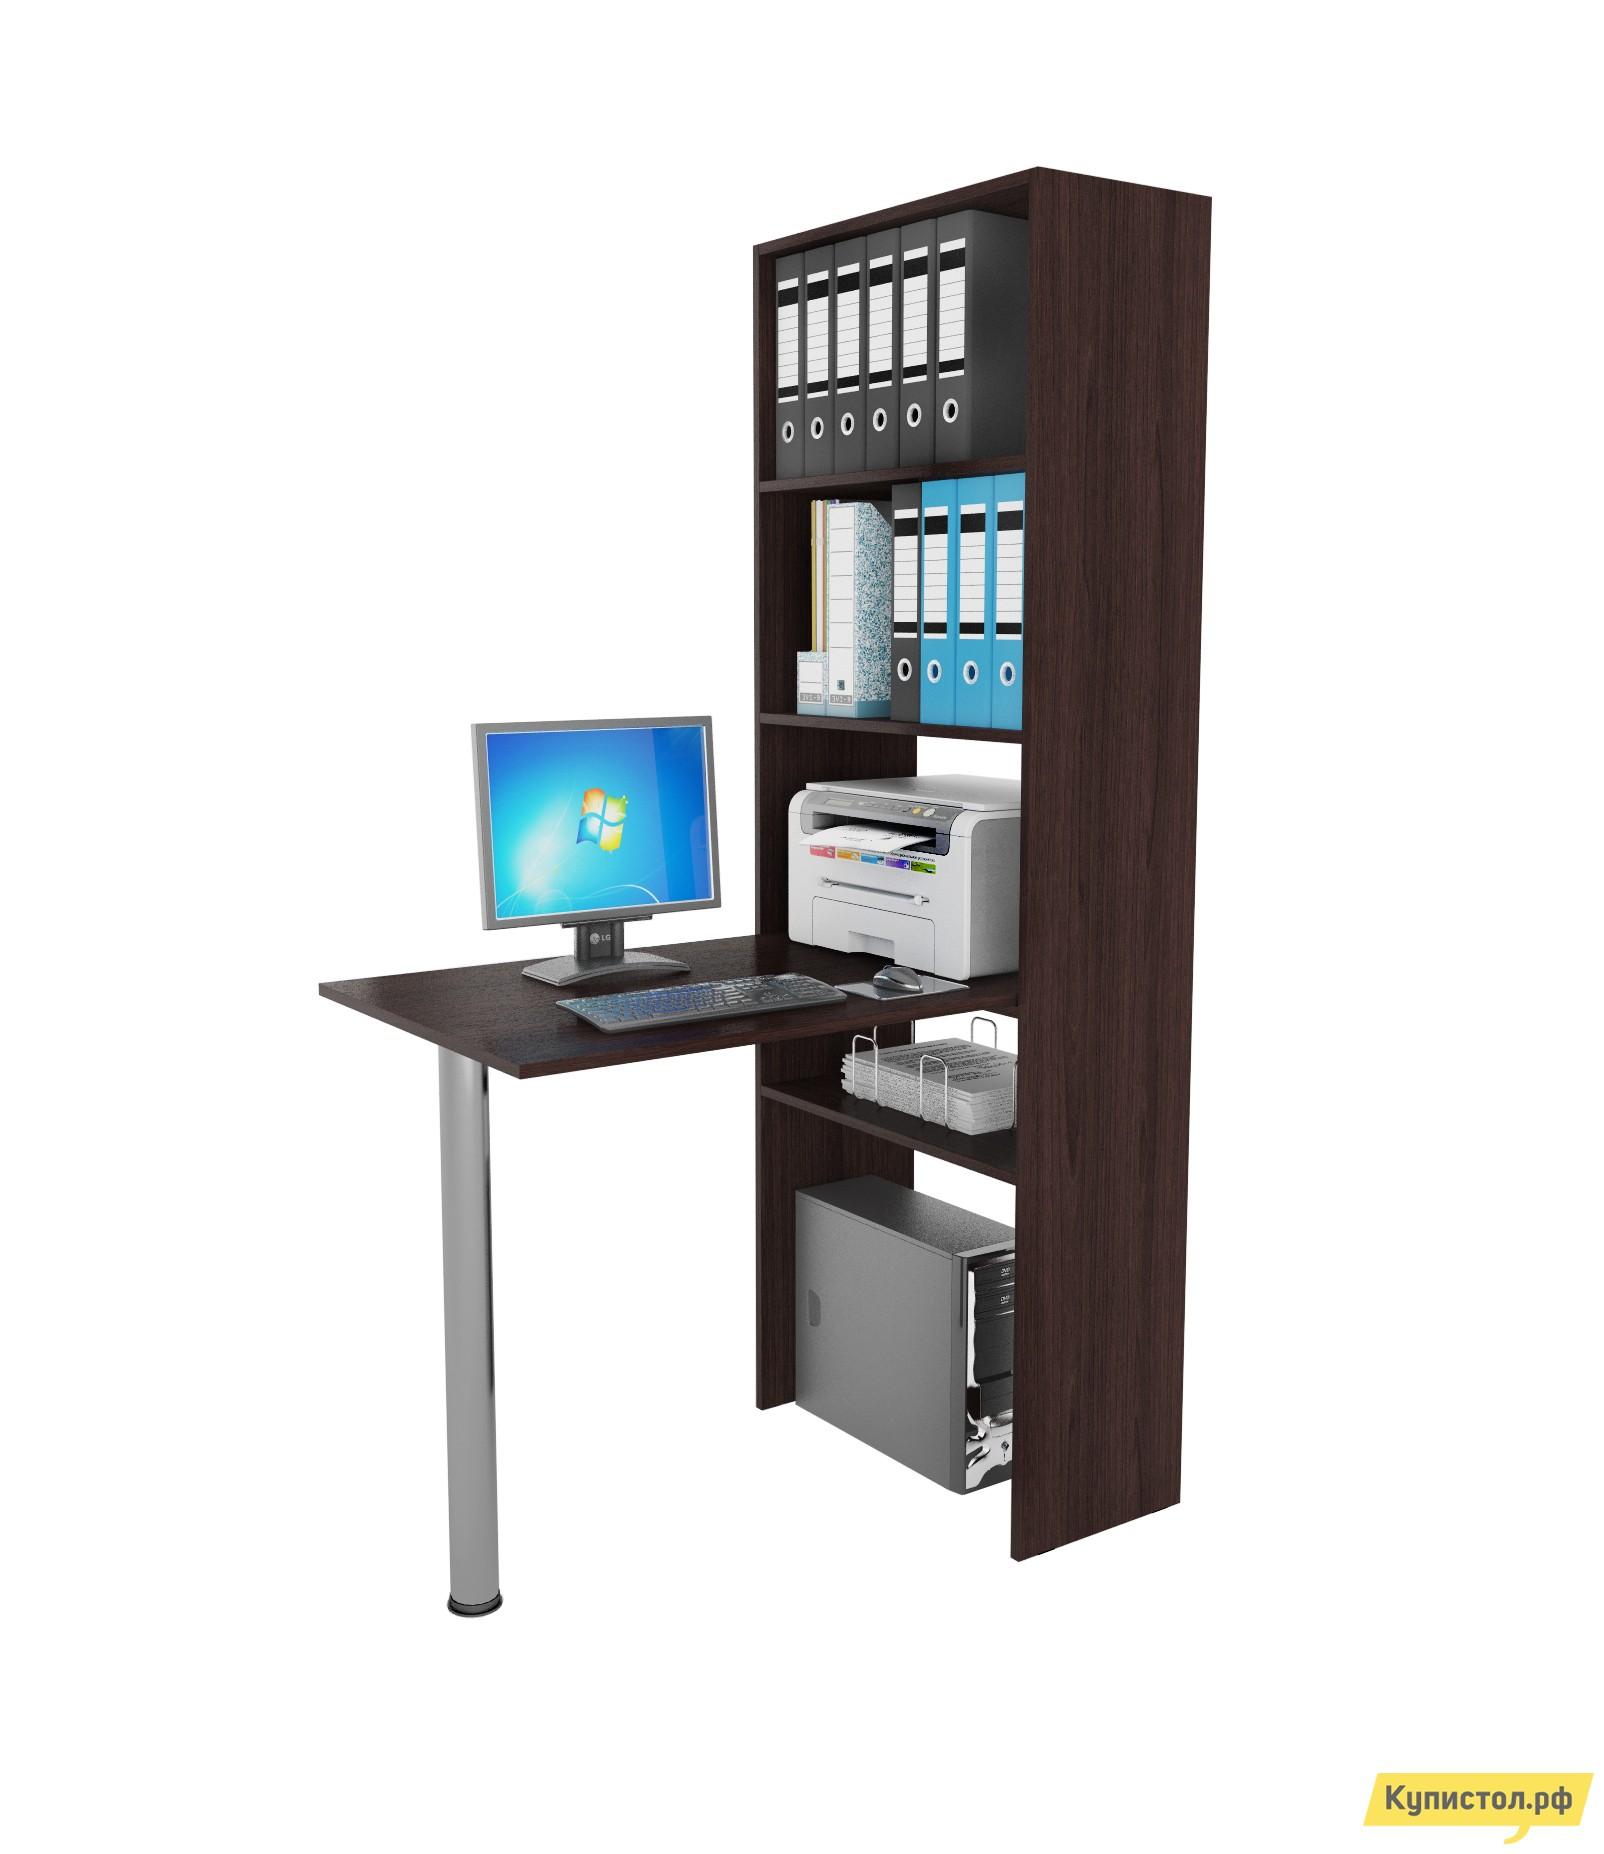 Компьютерный стол МФ Мастер Рикс-4 + Рикс-6 Венге